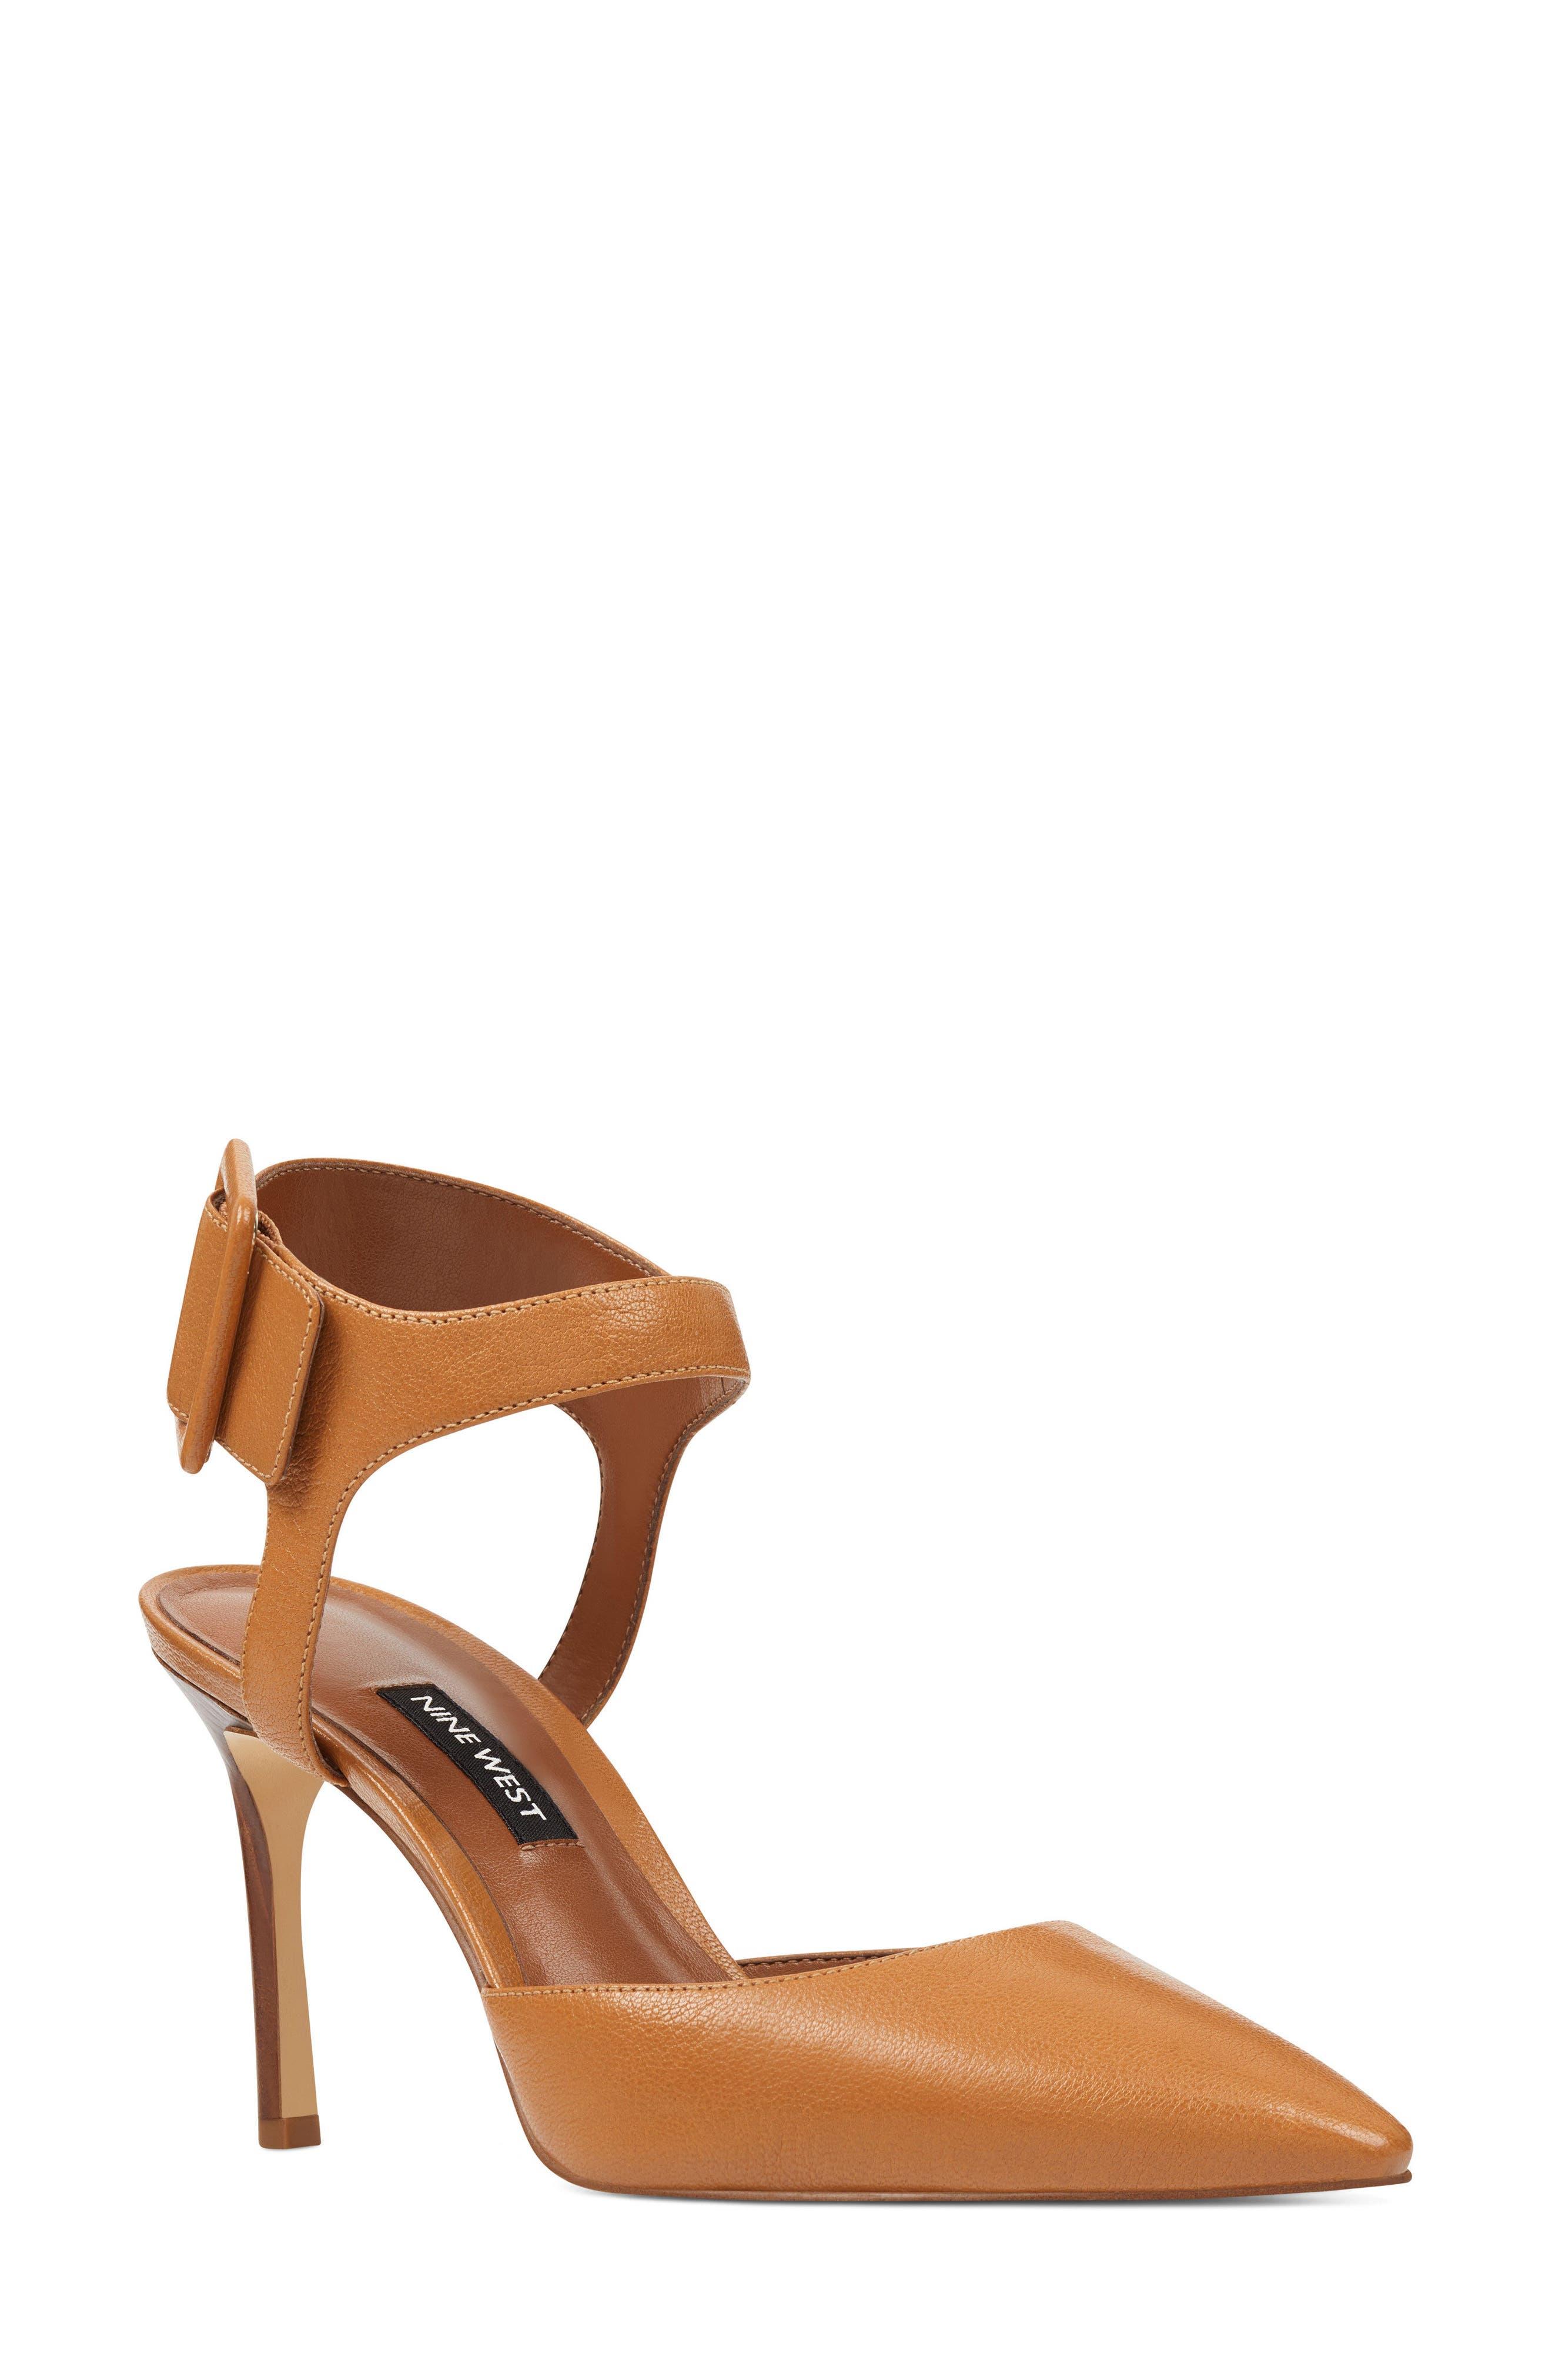 Elisabeti Ankle Cuff Pump,                         Main,                         color, Dark Natural Leather